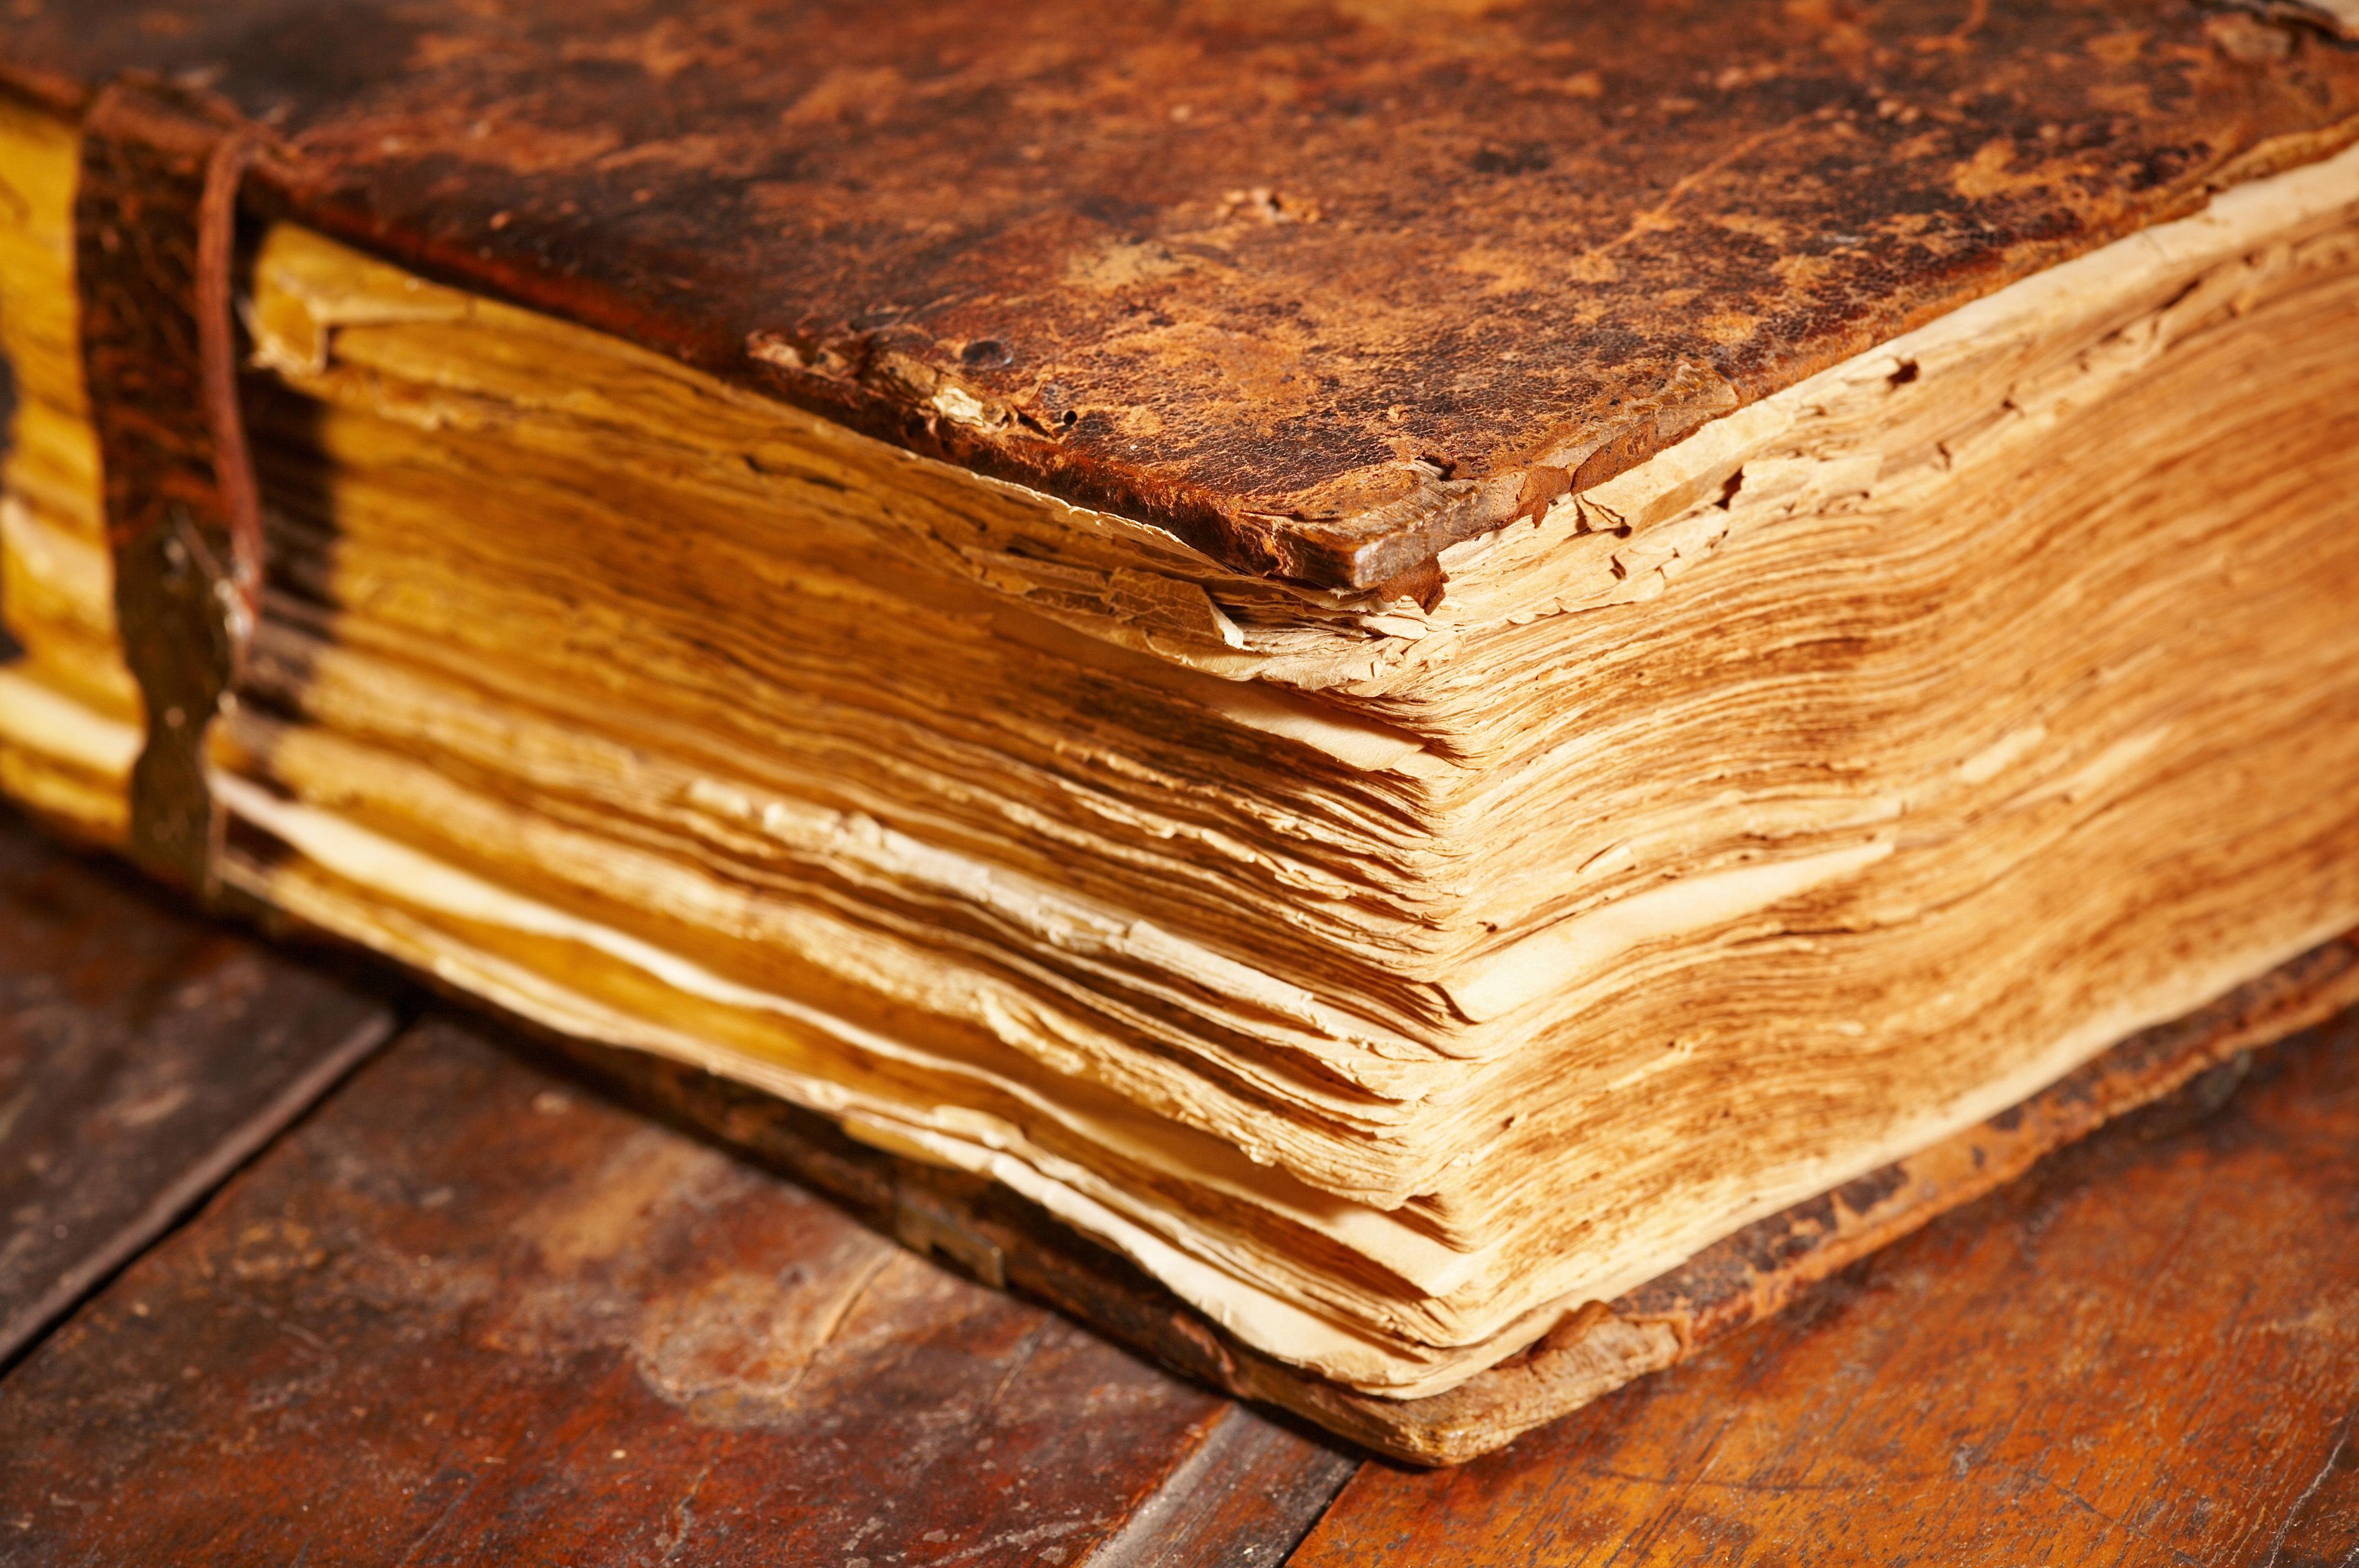 бхатия картинки древние книги обои придала